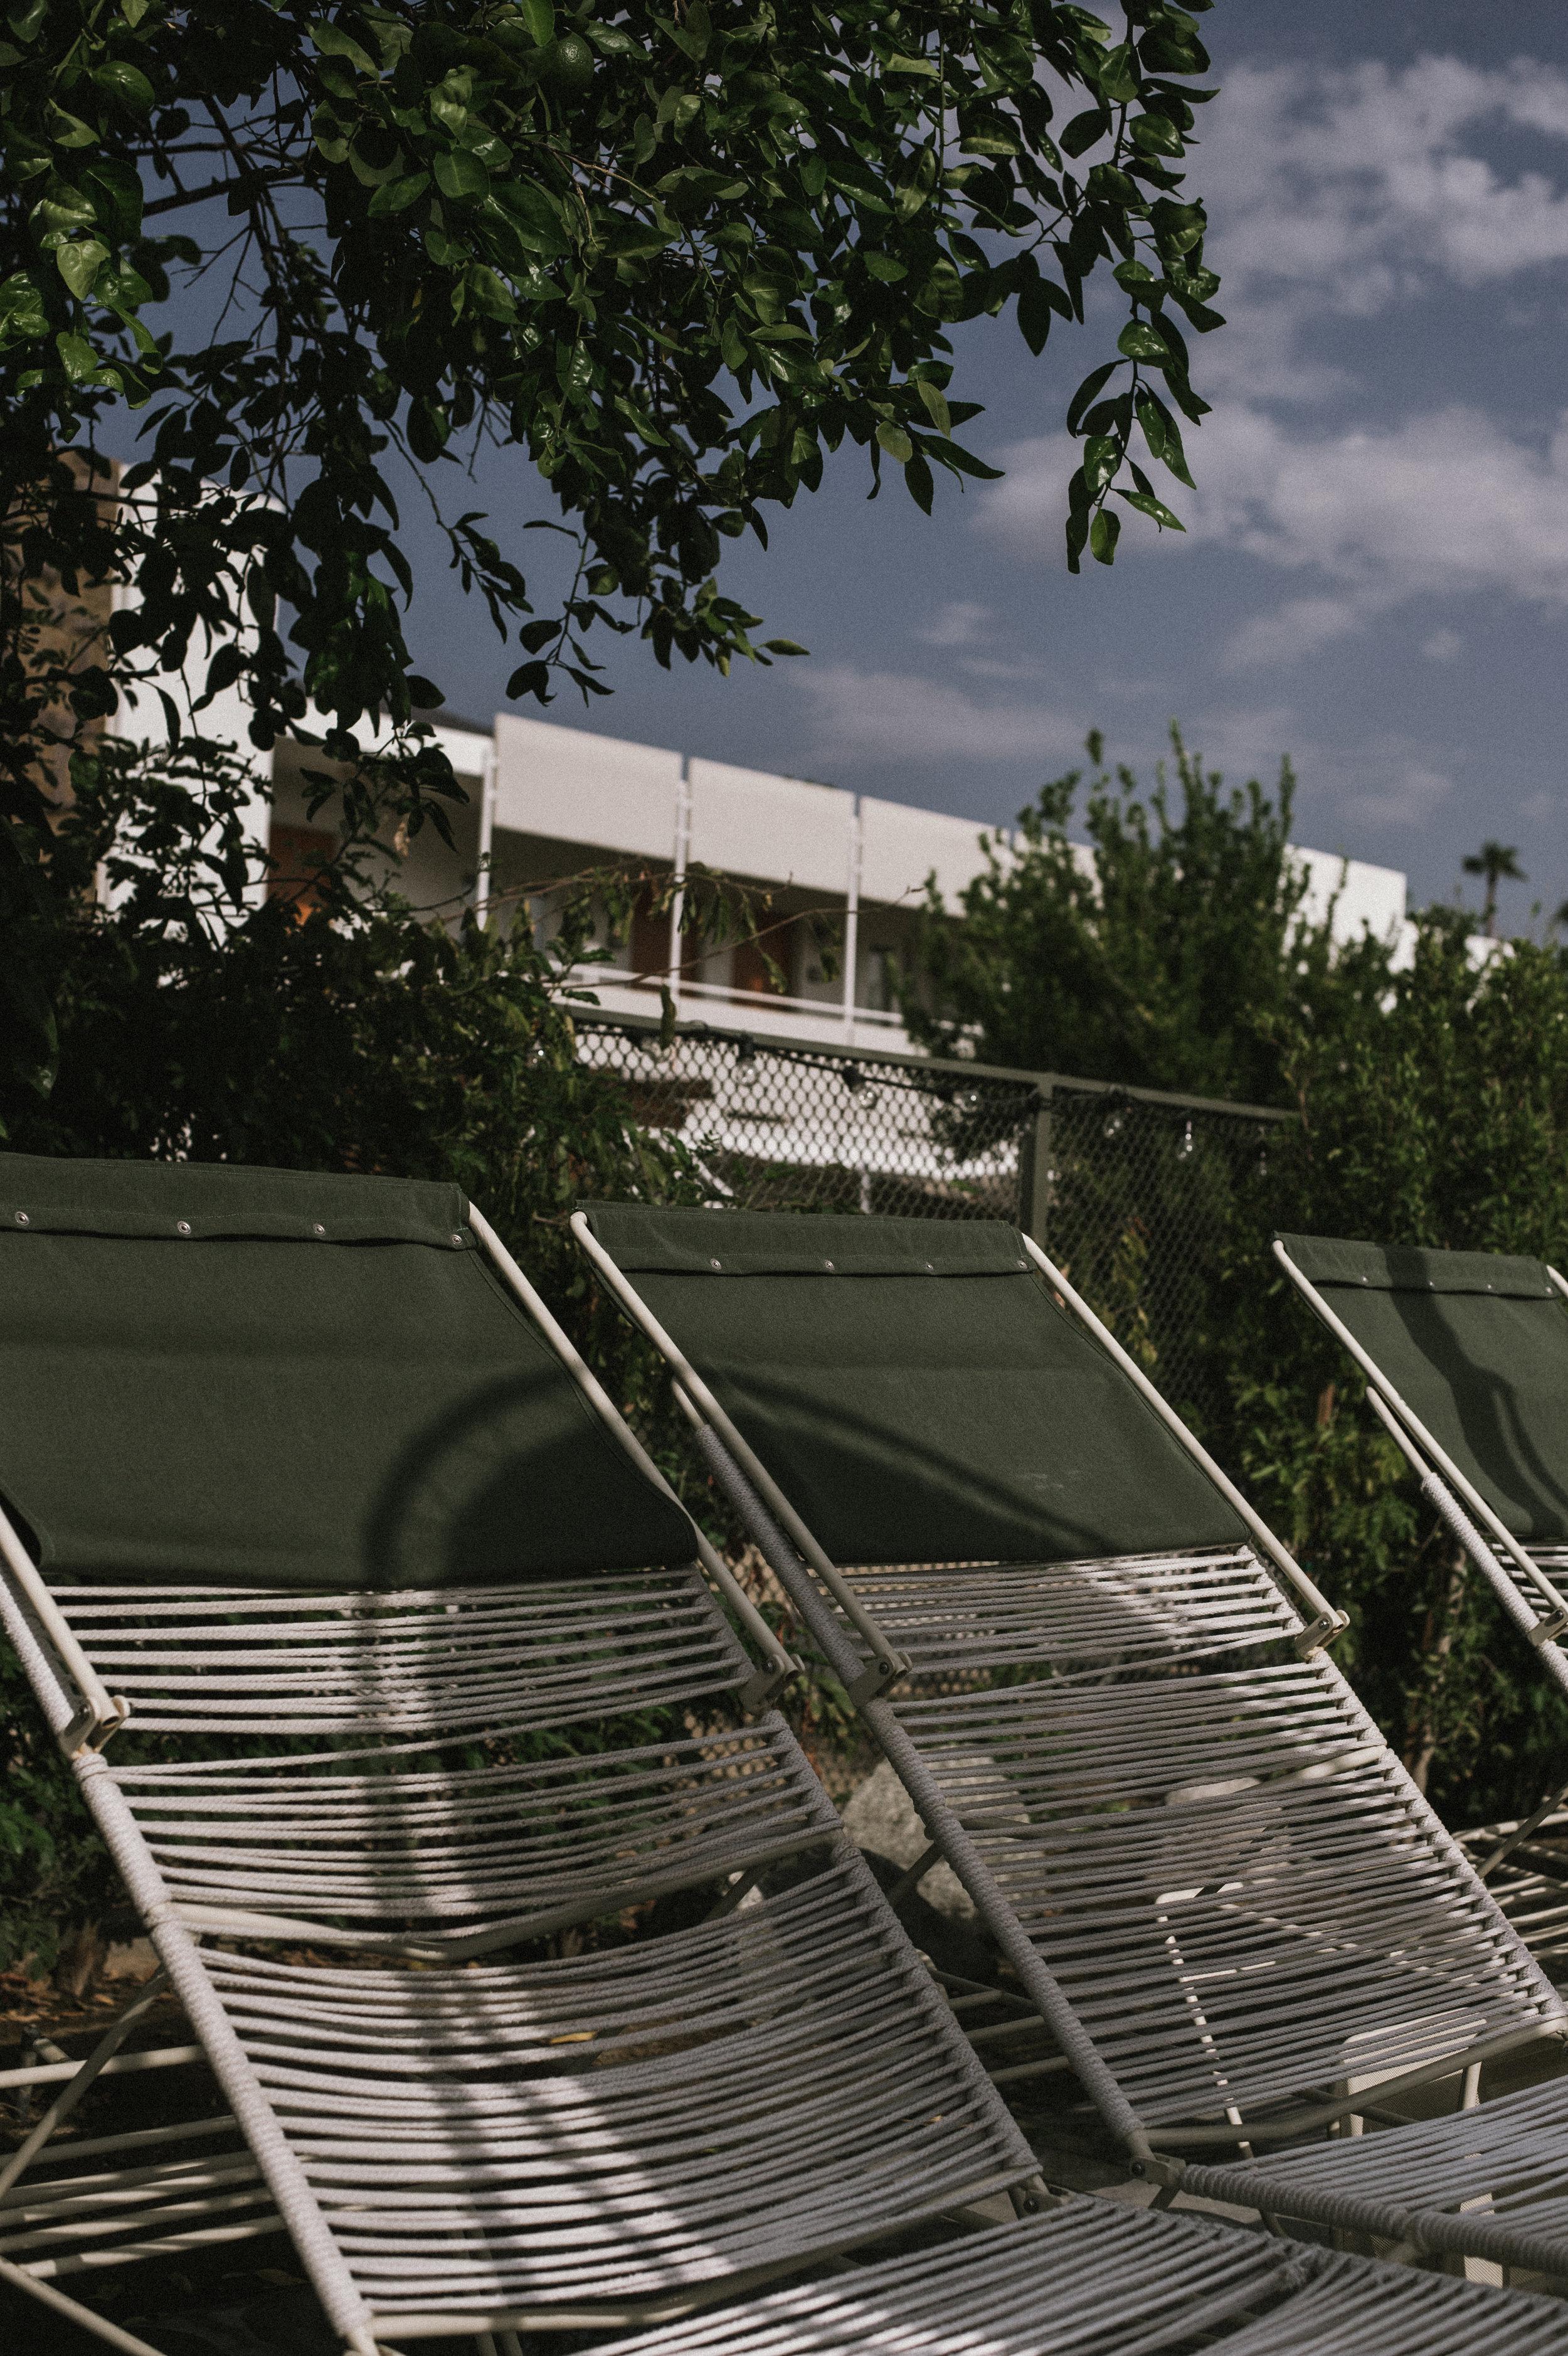 The-Glossier-Ace-Hotel-Palm-Springs-CA-46.jpg